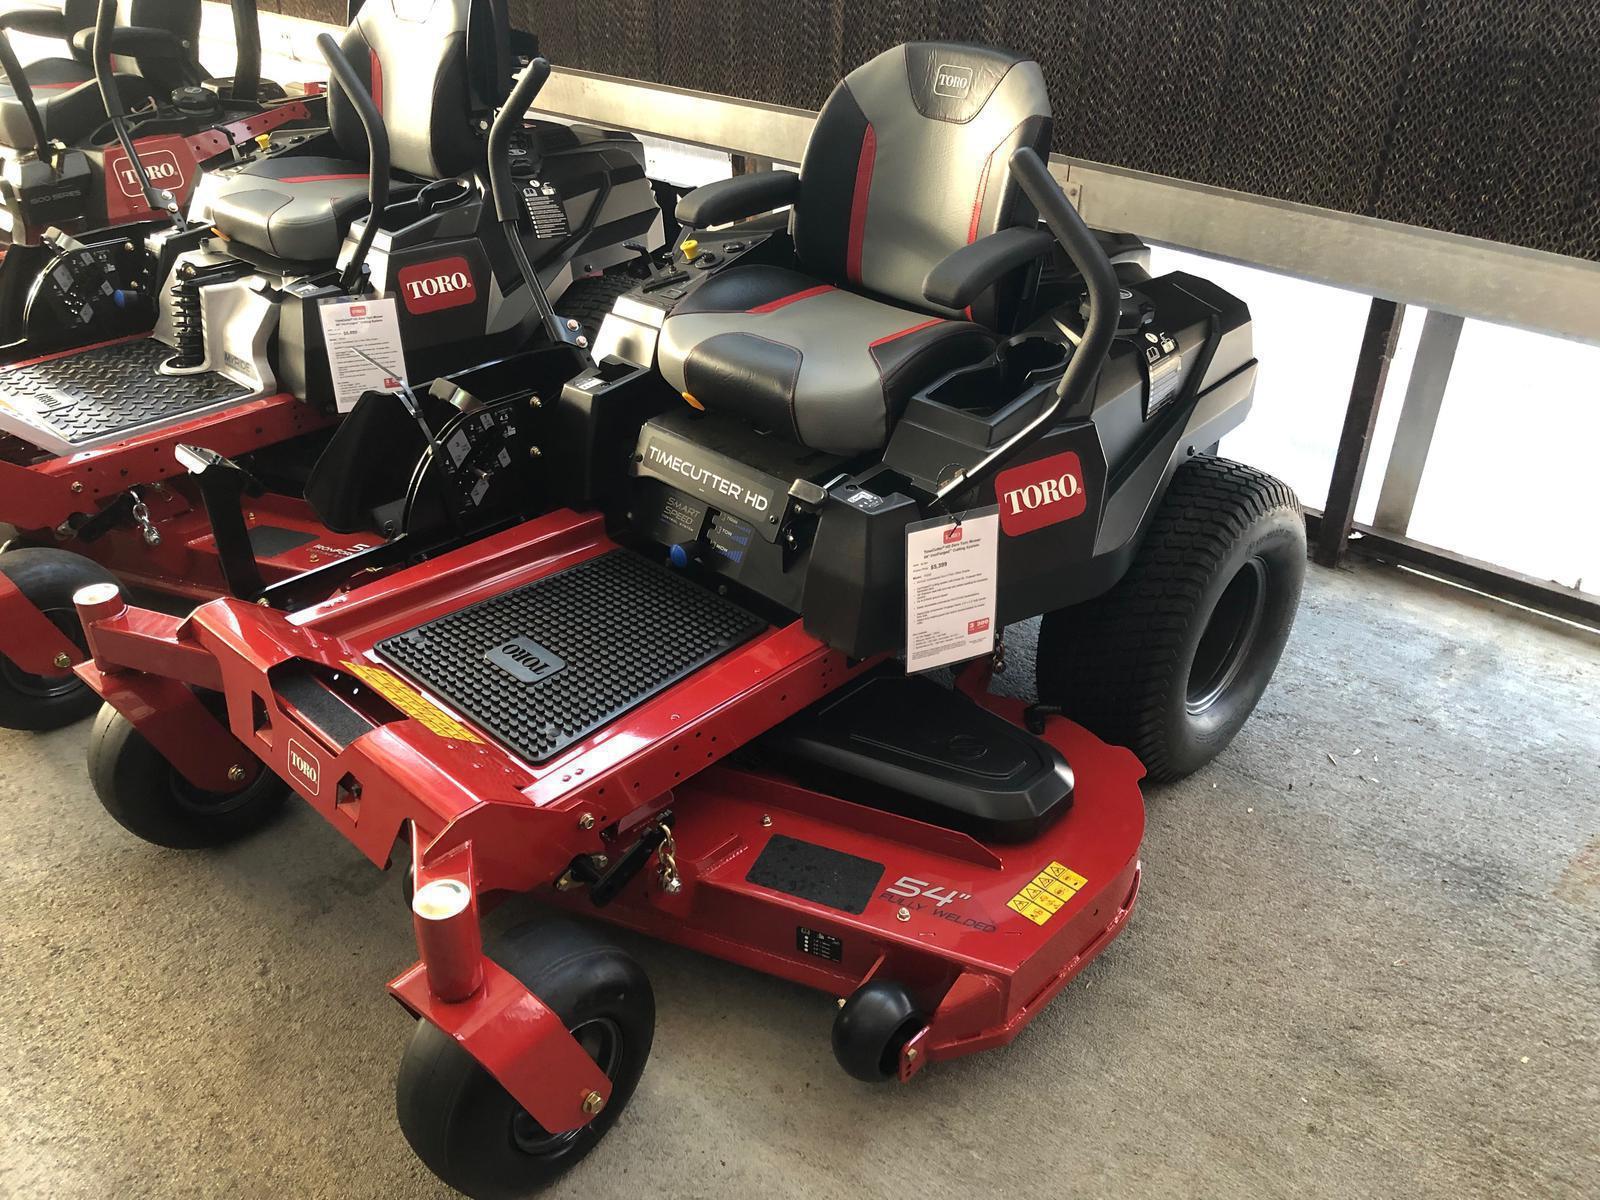 Inventory from Toro Hudson's Hardware & Outdoor Equipment